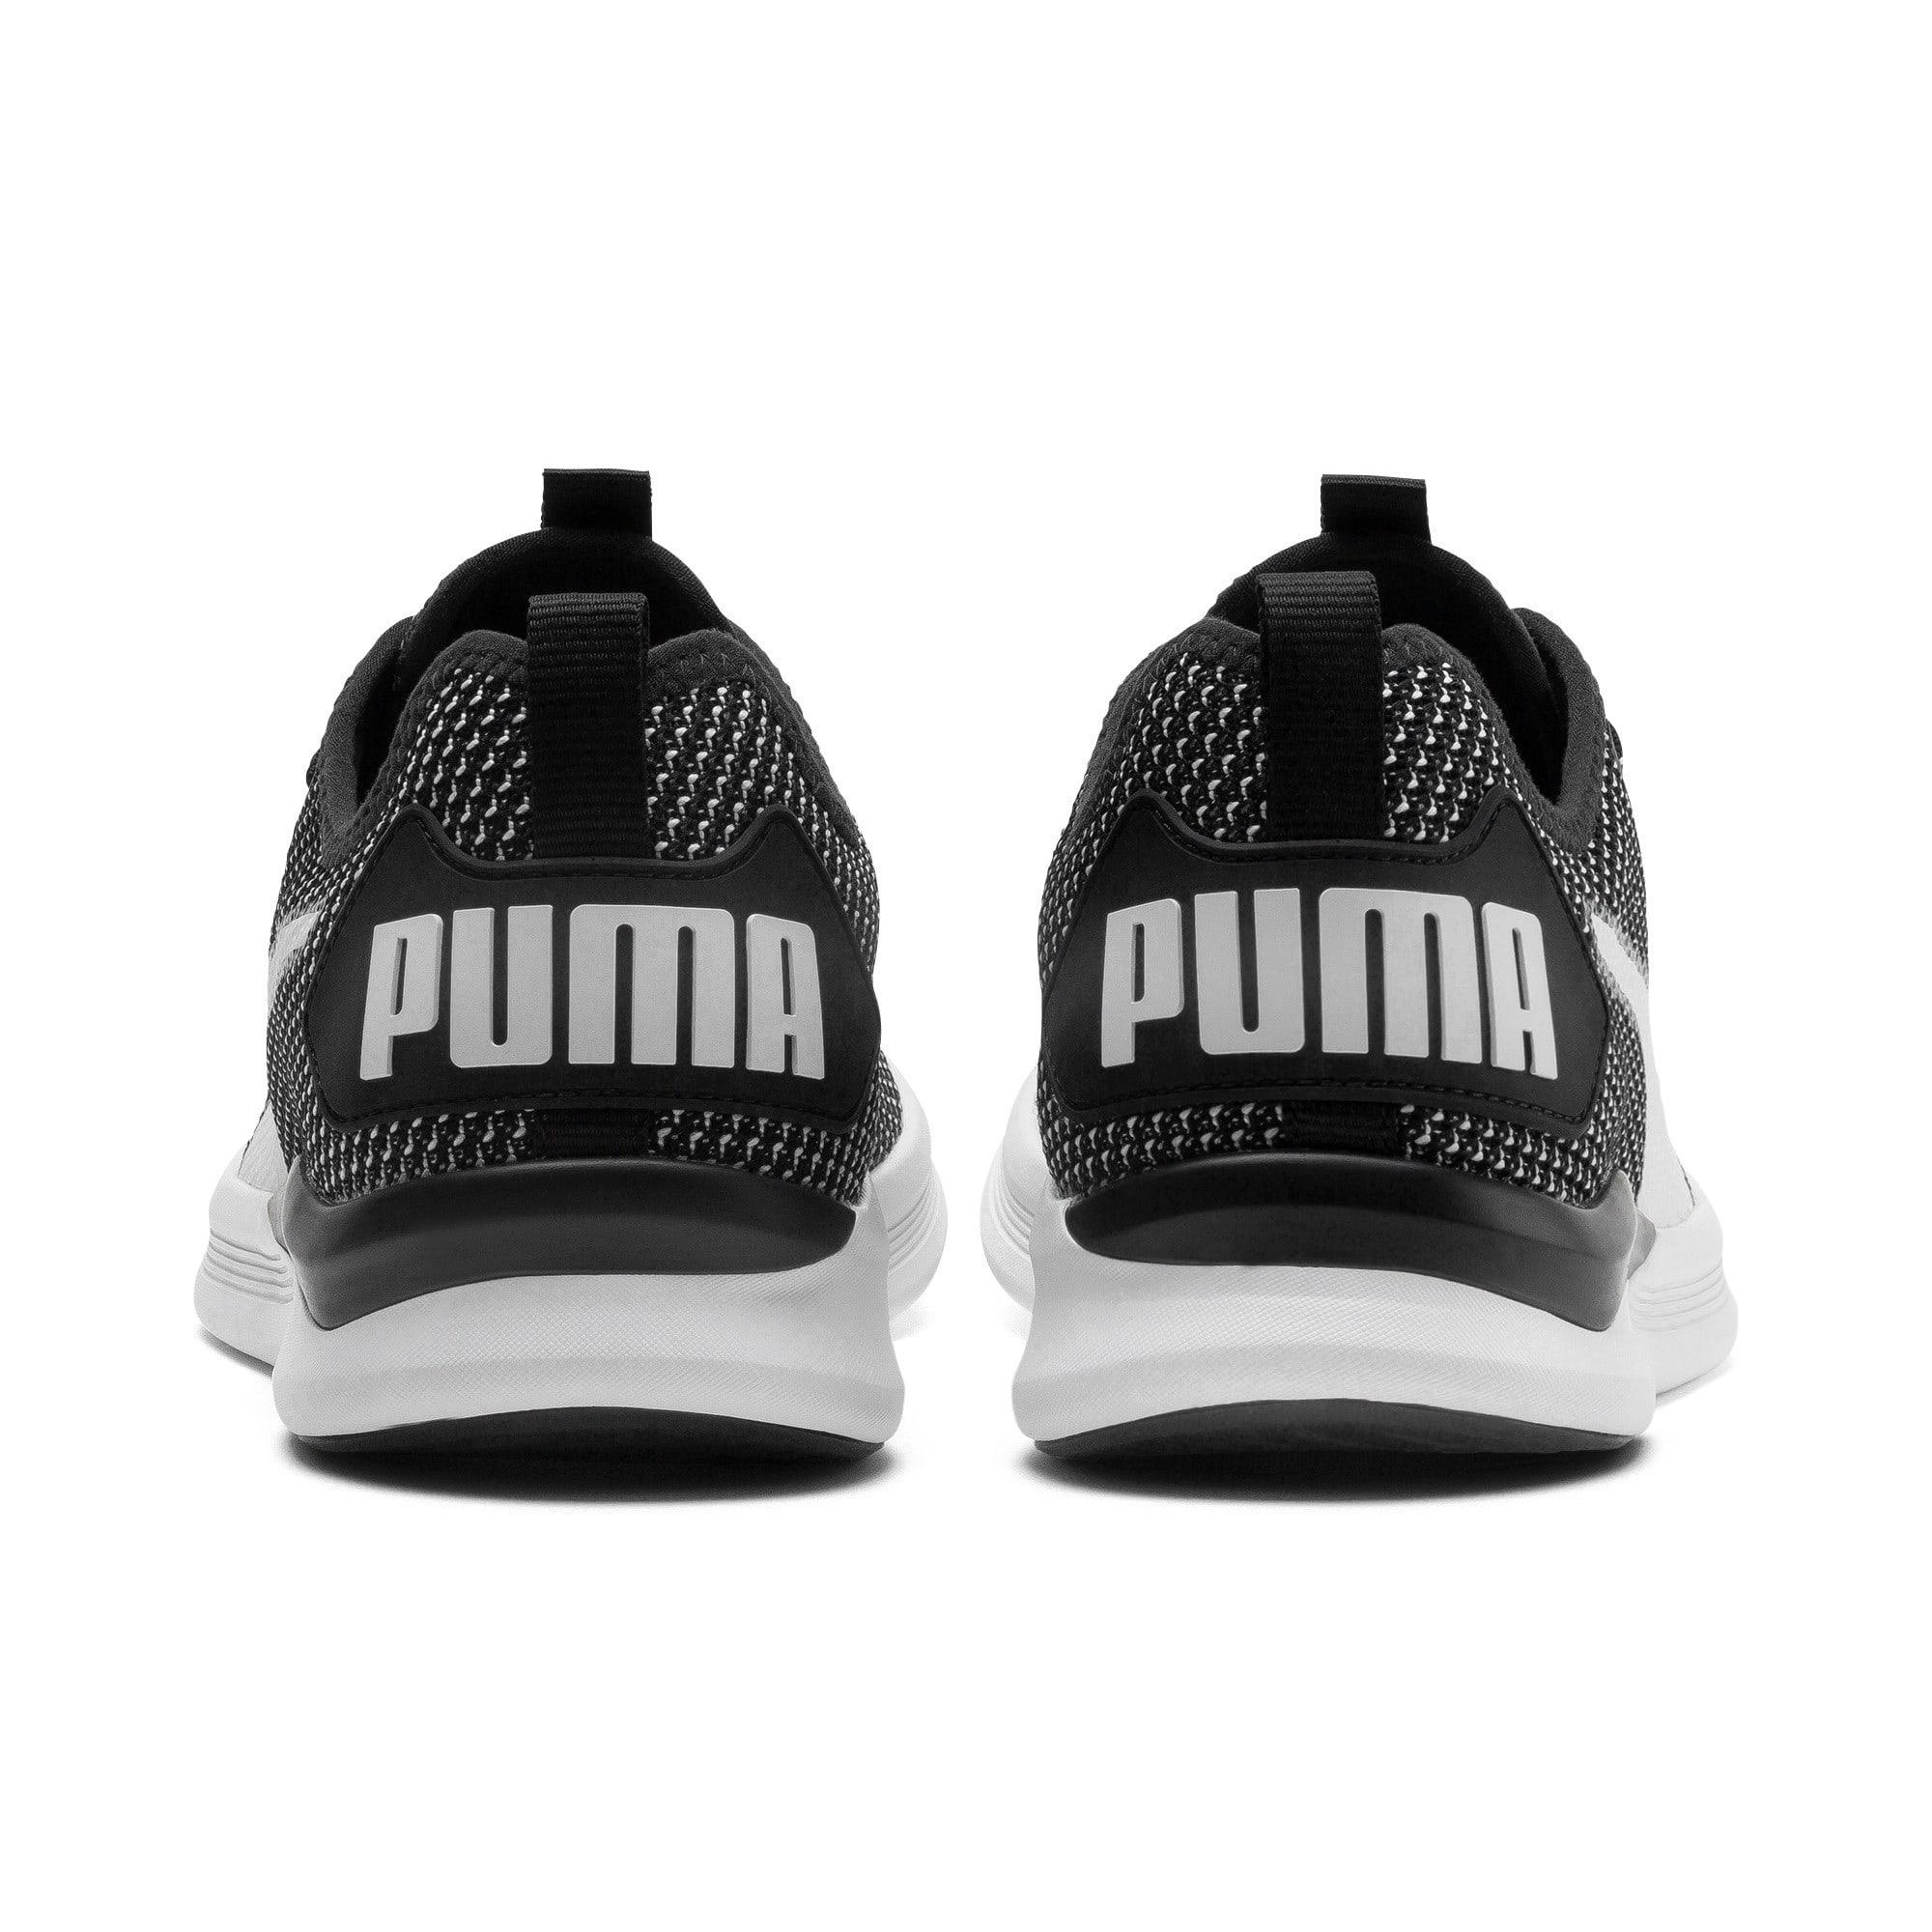 Thumbnail 3 of IGNITE Flash FS Men's Running Shoes, Puma Black-Puma White, medium